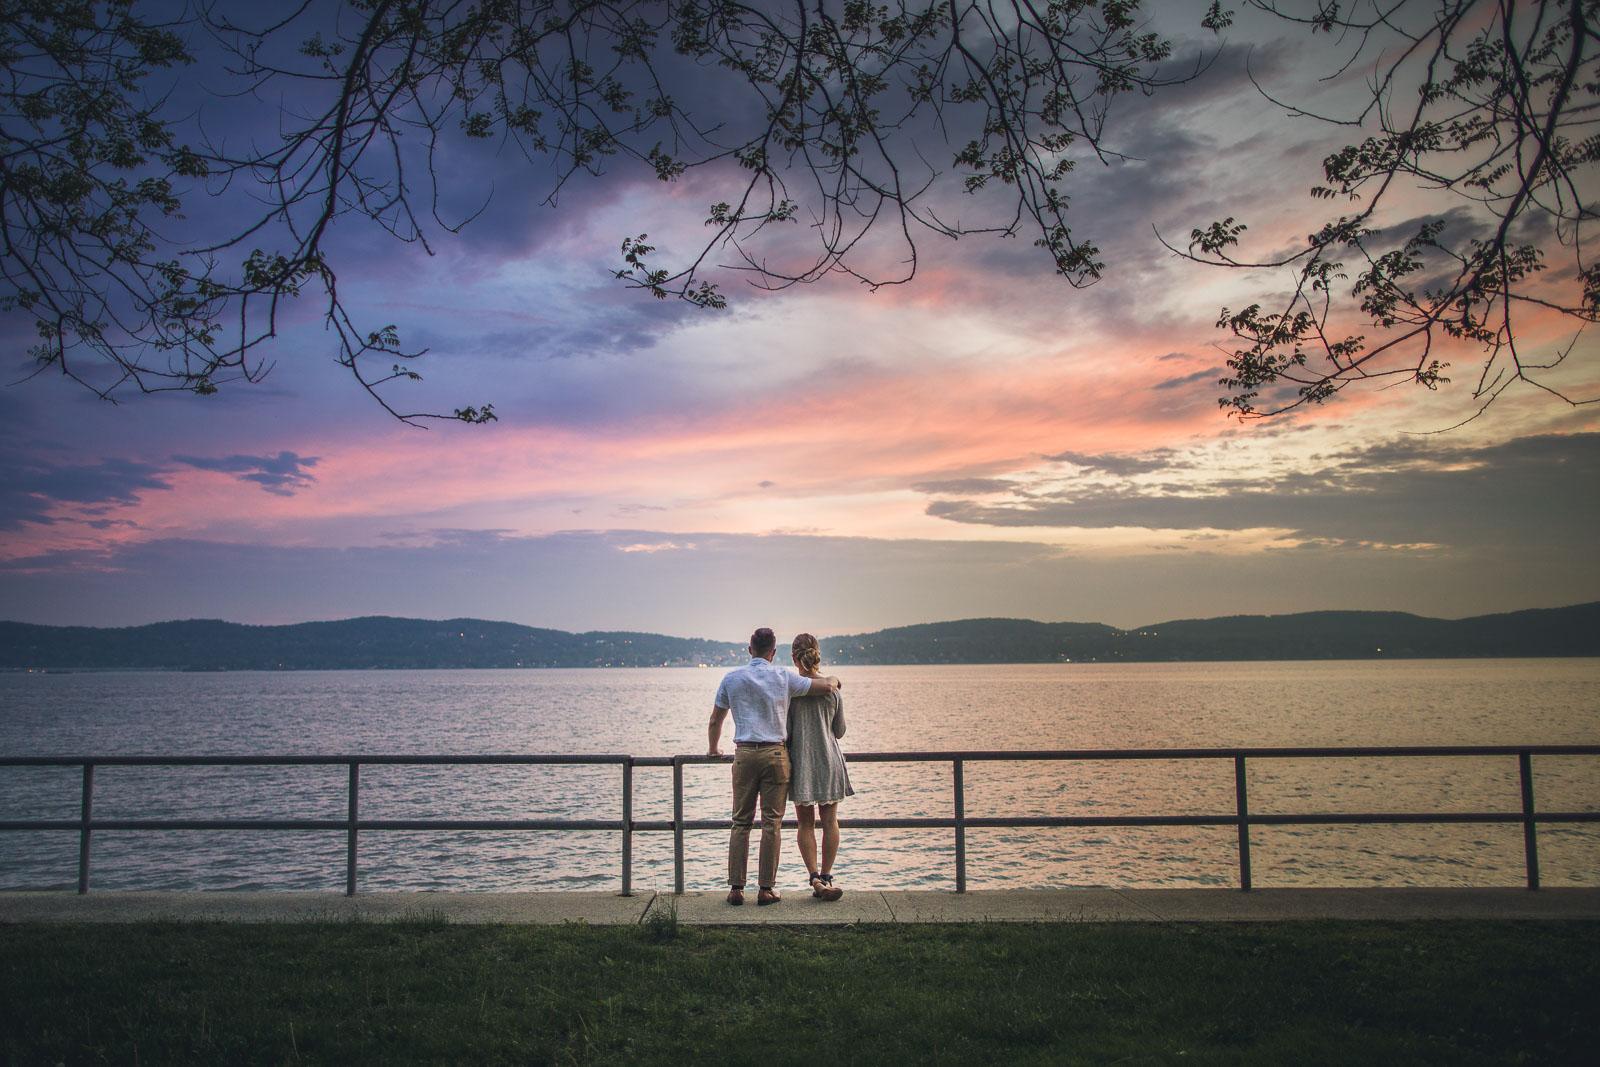 Sunset Tarrytown New York Photography